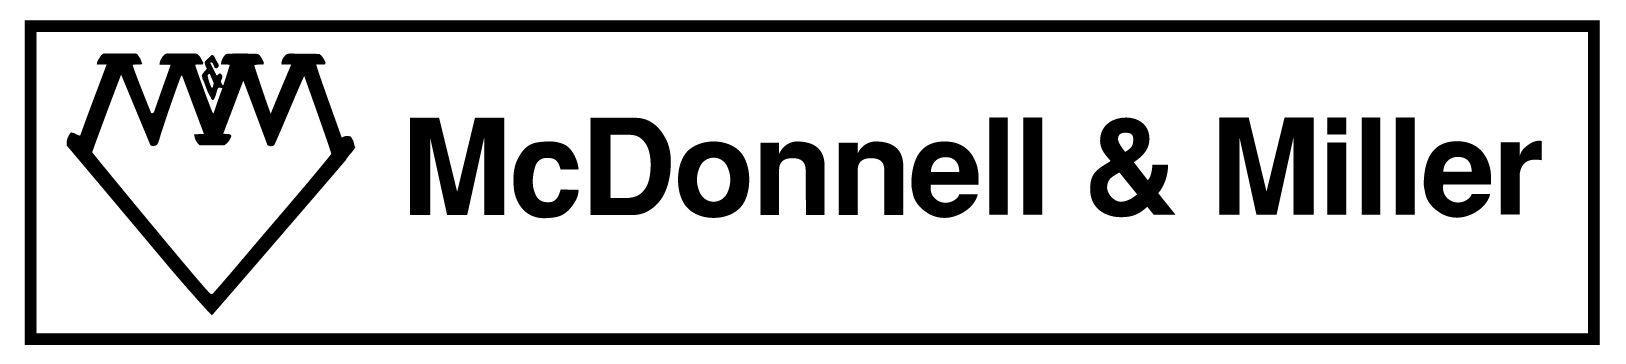 McDonnell Miller